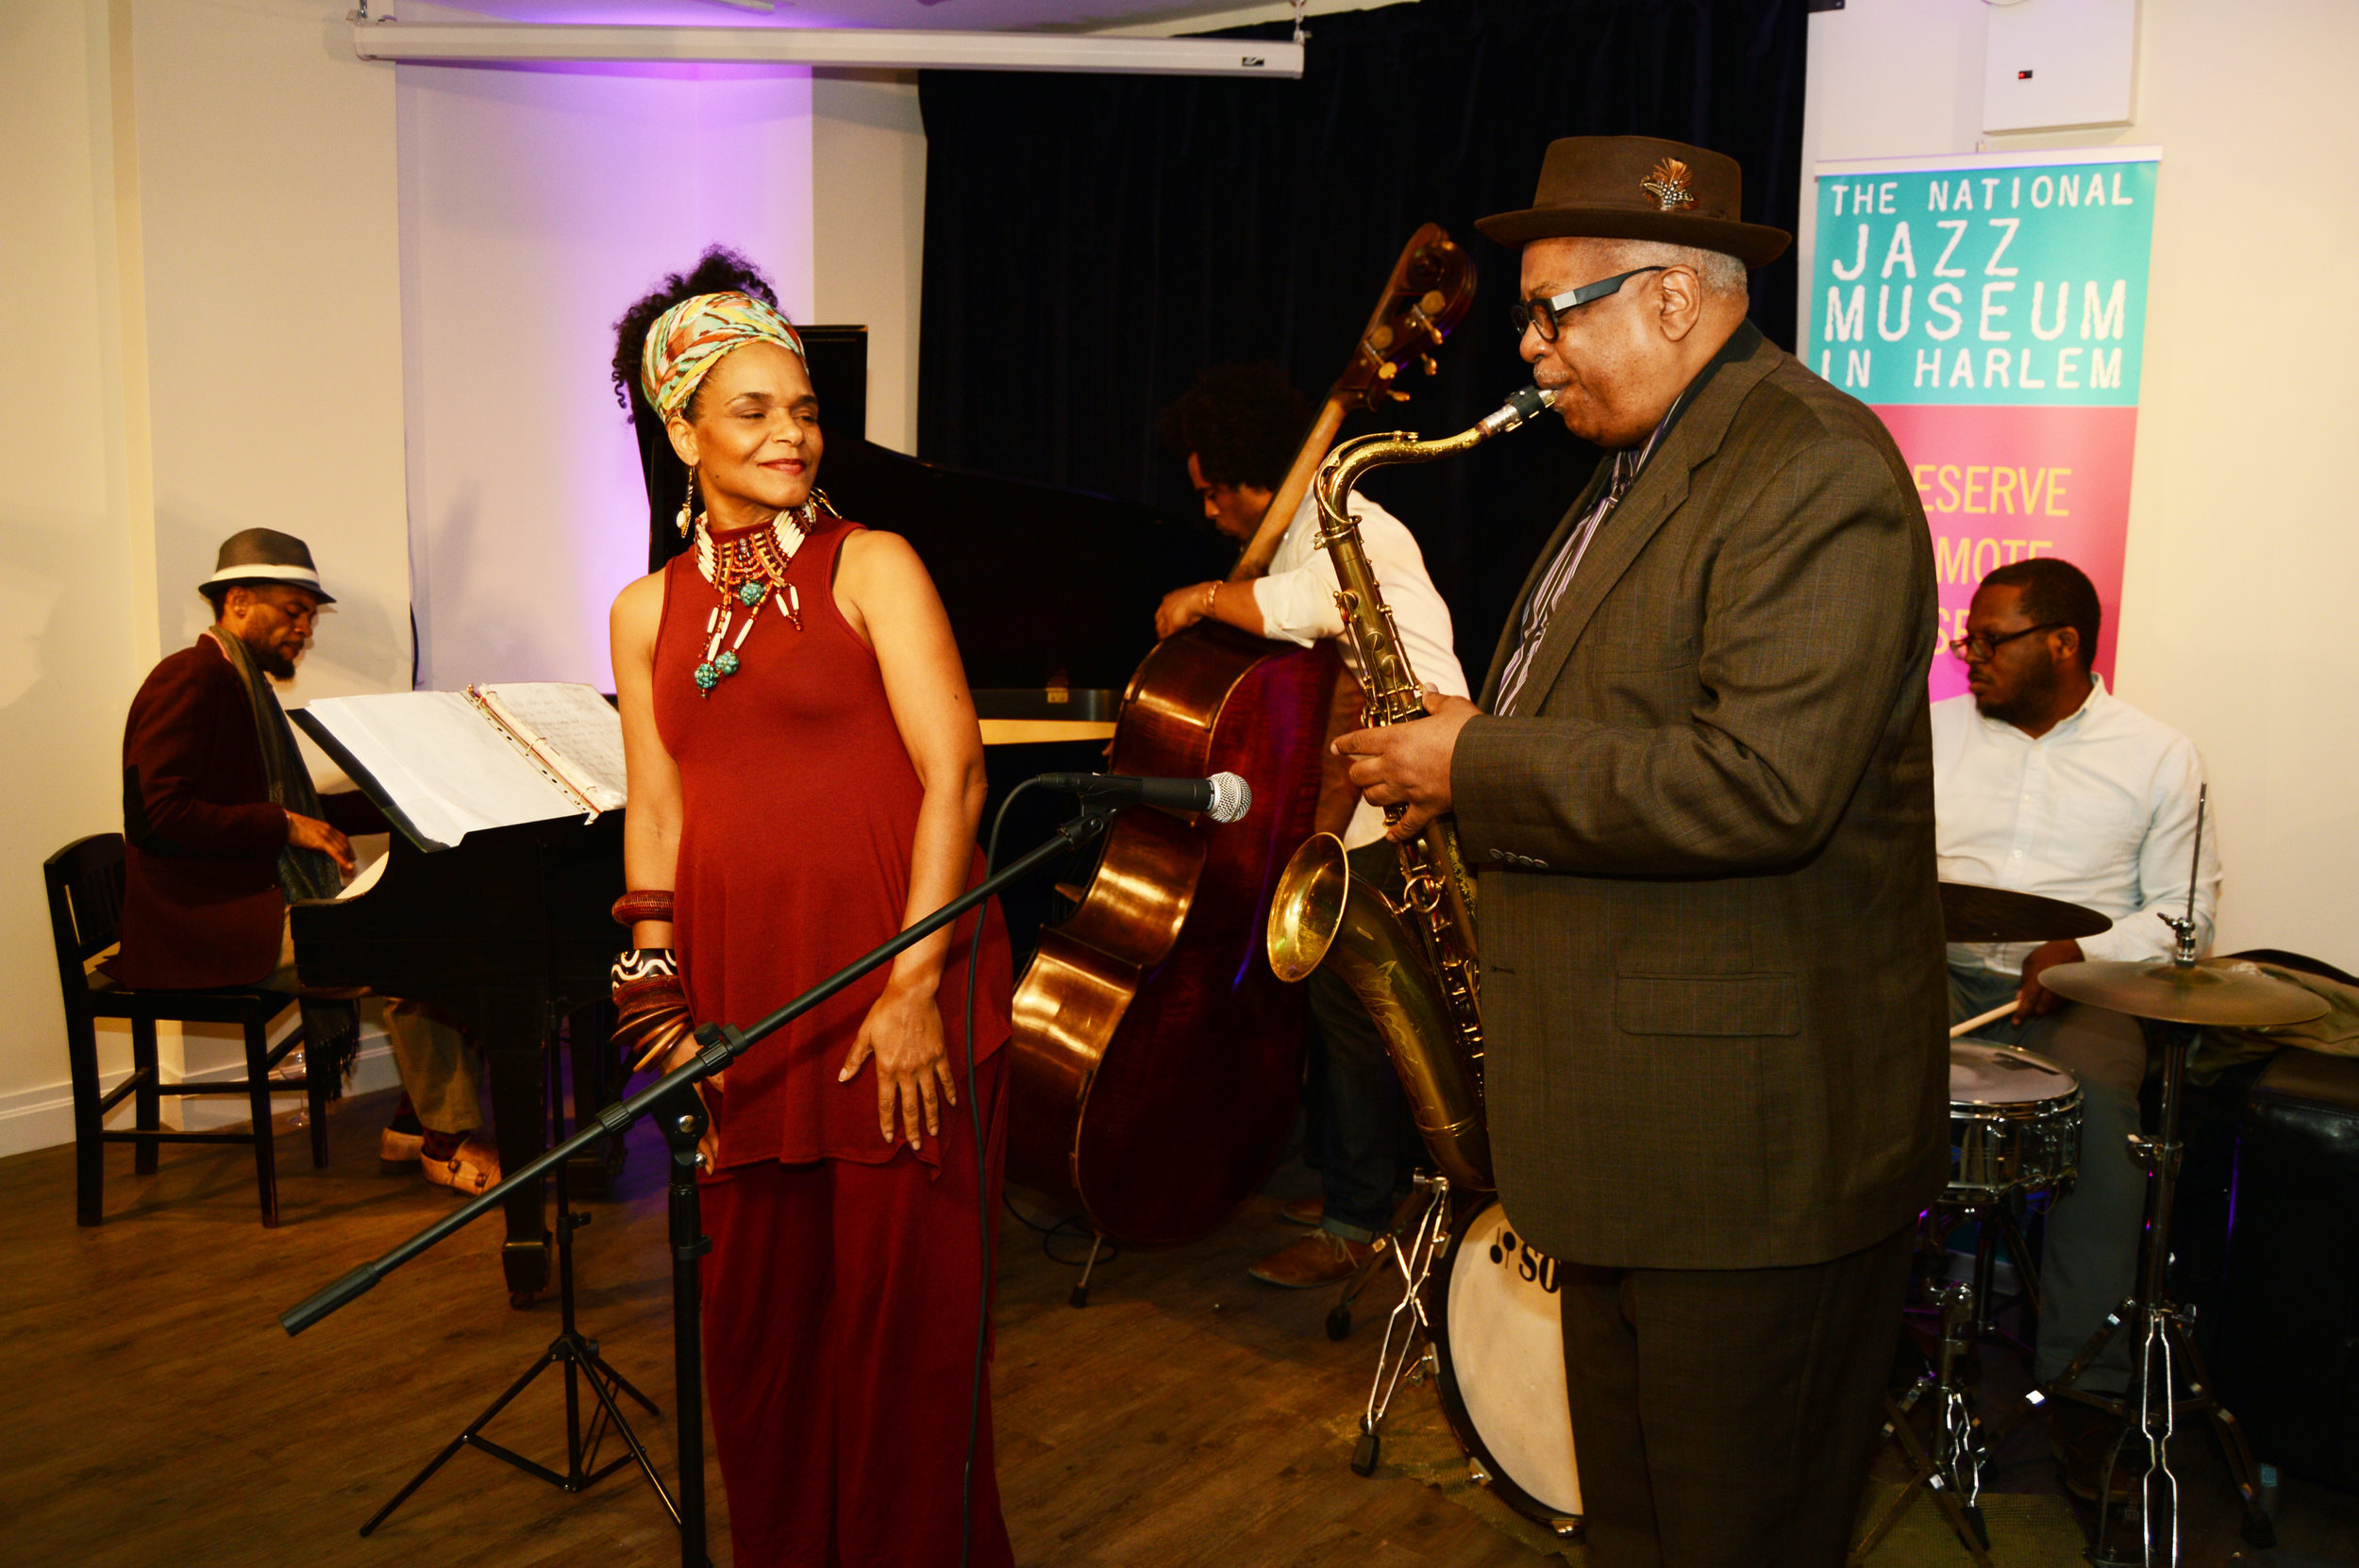 PHOTO: National Jazz Museum in Harlem Opening Celebration with Bill Saxton Singer and Terri Davis / Photo: Richard Conde